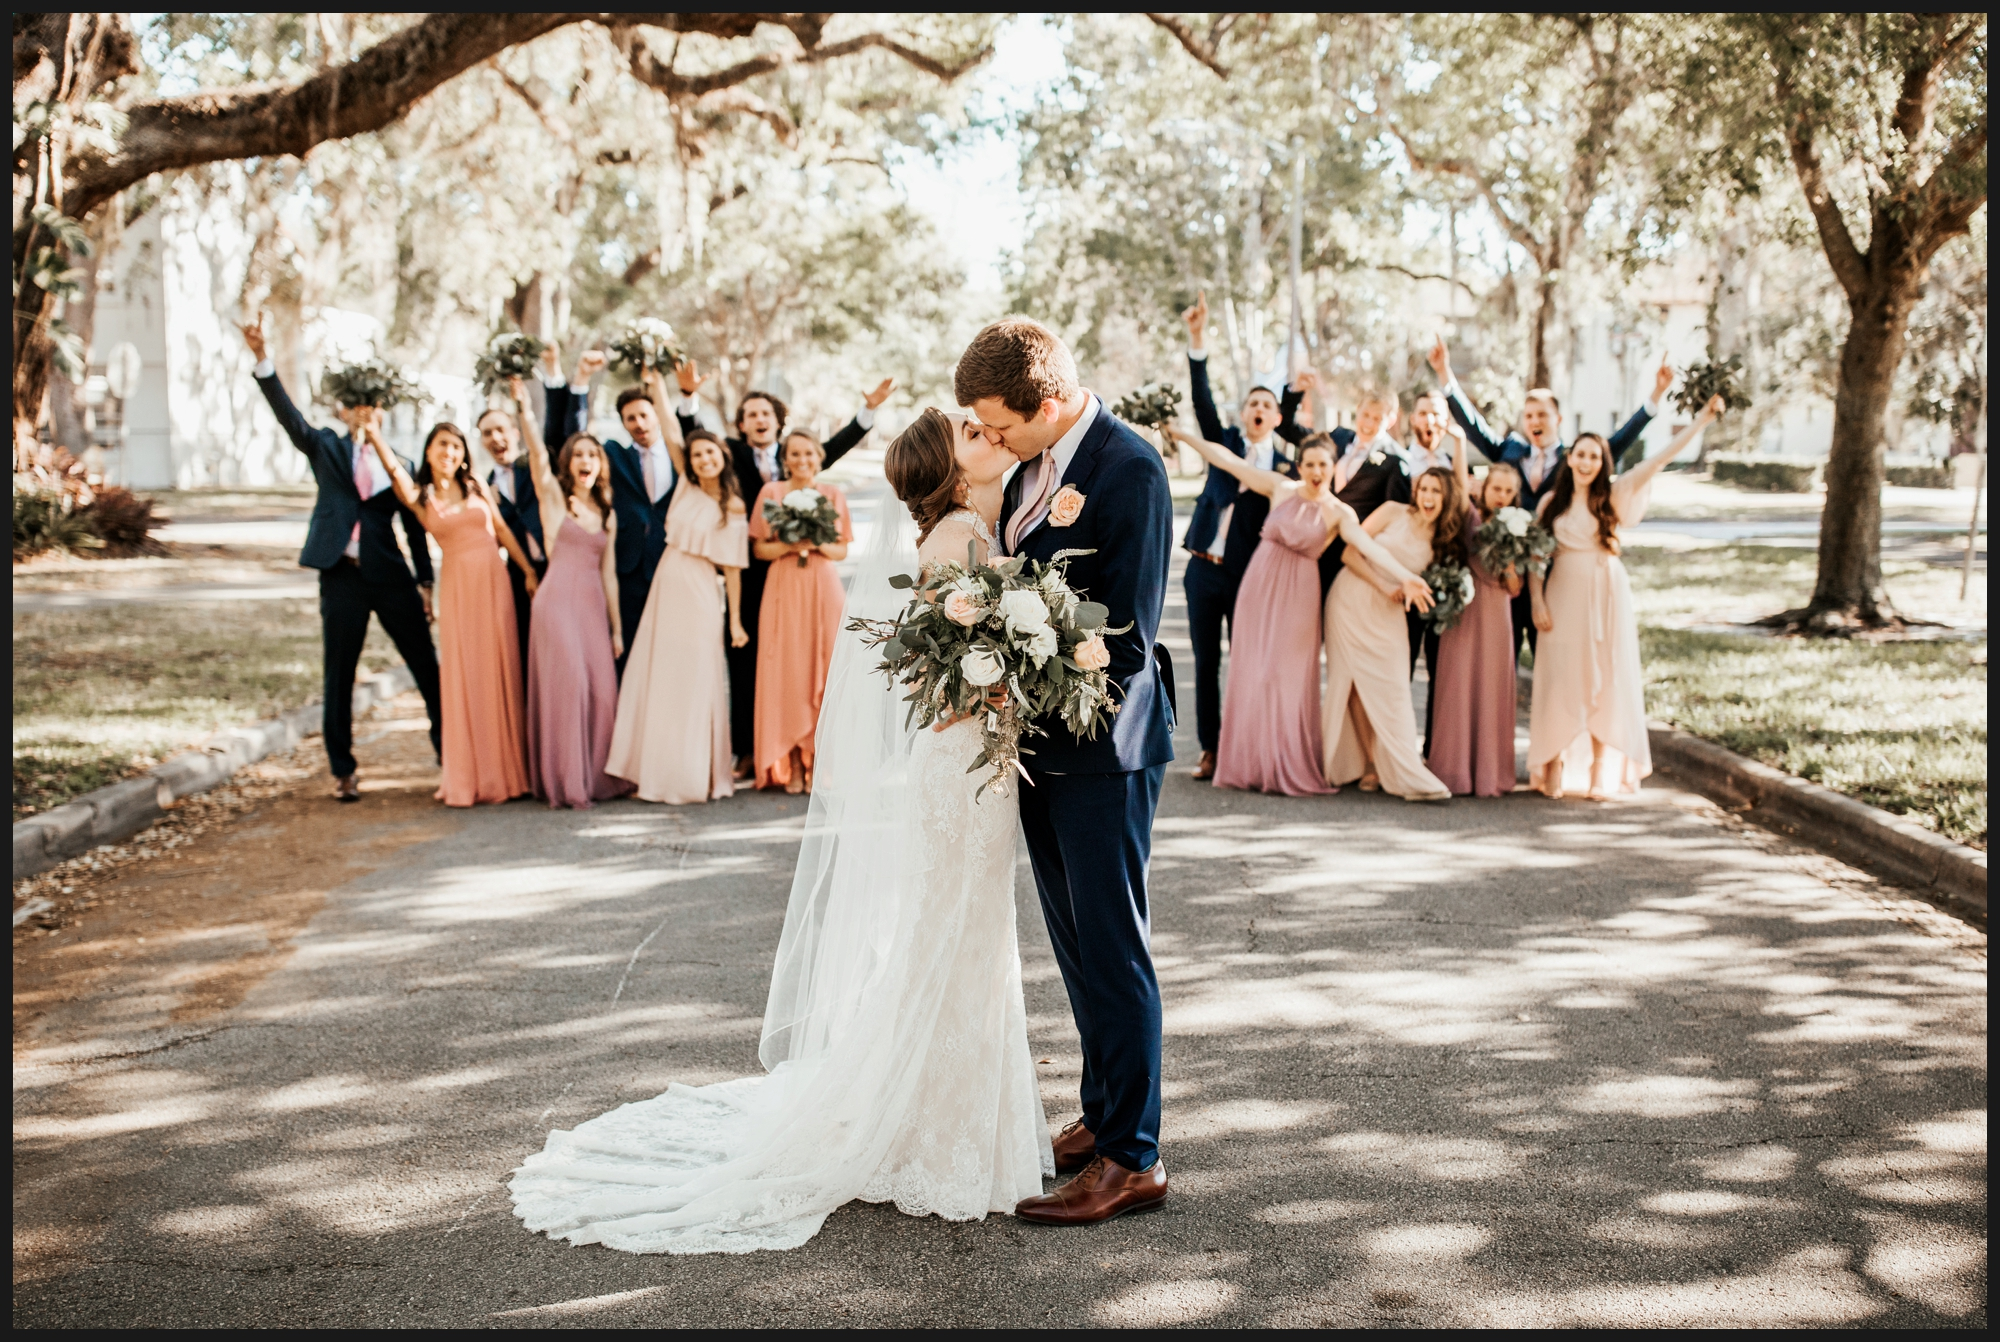 Orlando-Wedding-Photographer-destination-wedding-photographer-florida-wedding-photographer-bohemian-wedding-photographer_1753.jpg